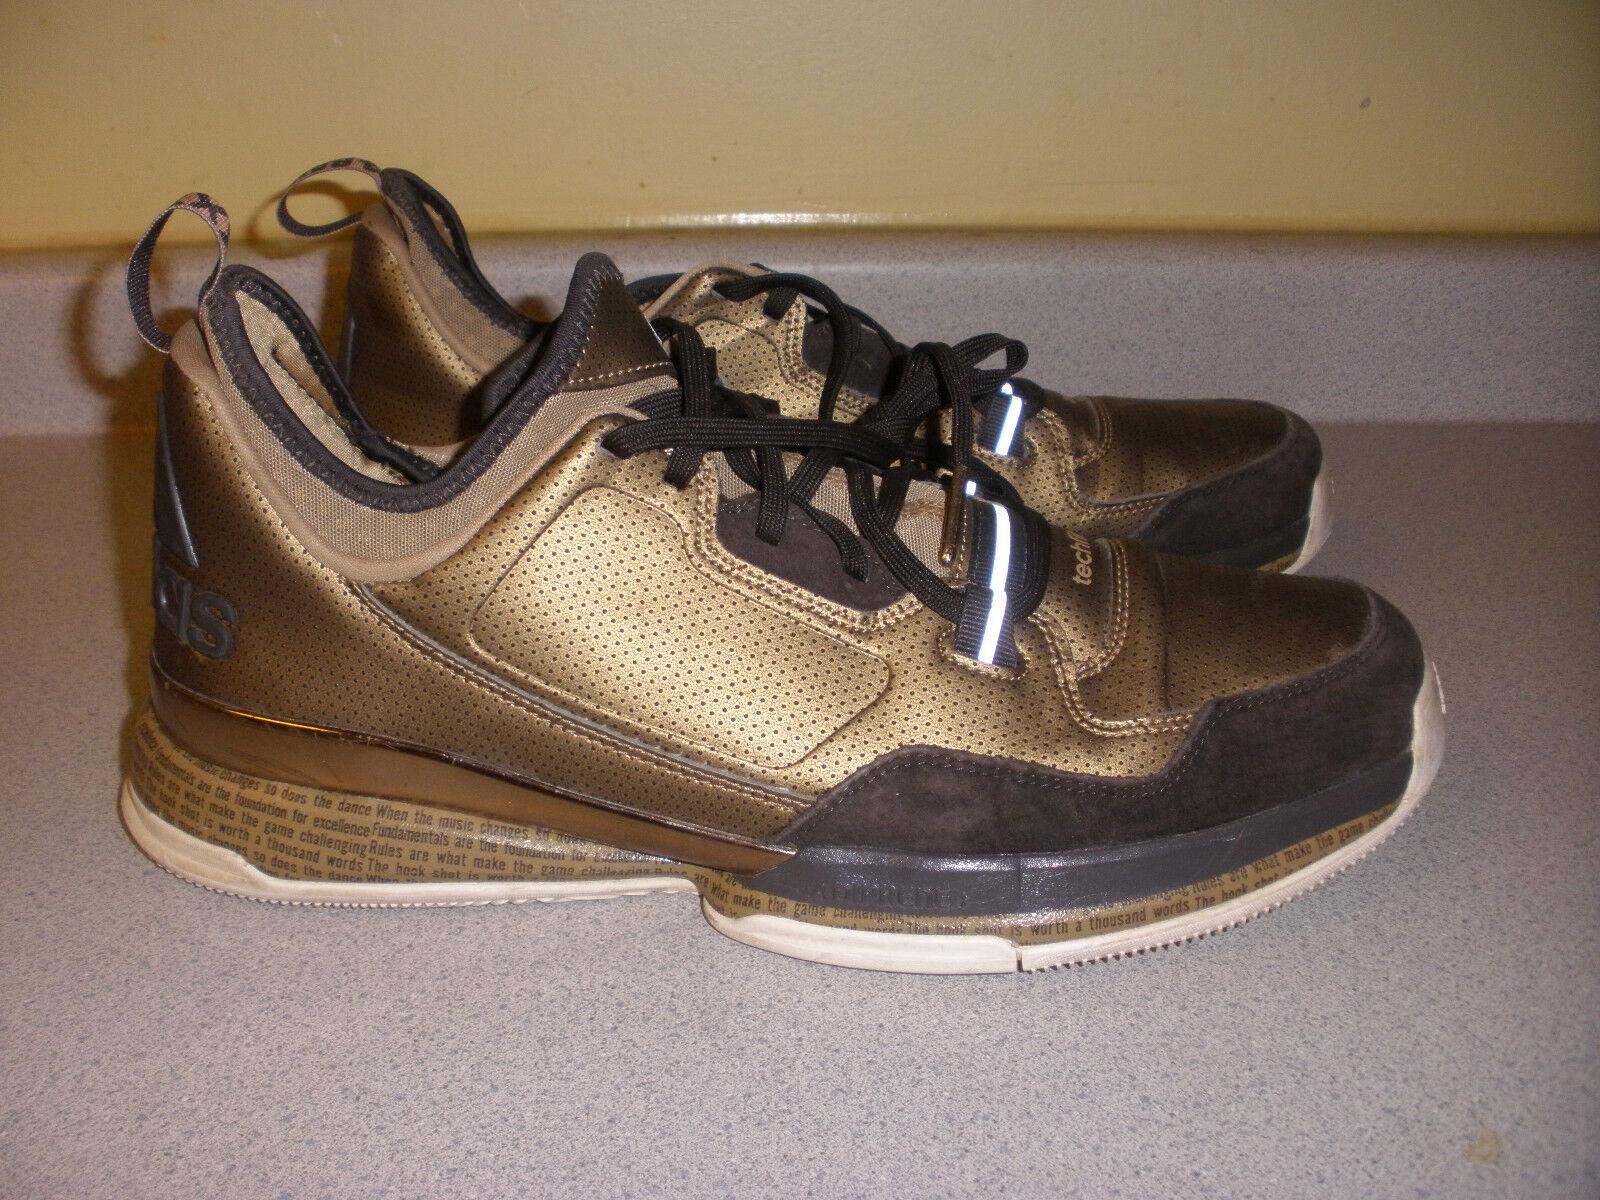 Adidas d lillard 1 scarpe da brown uomo taglia noi 13,5 brown da db626c